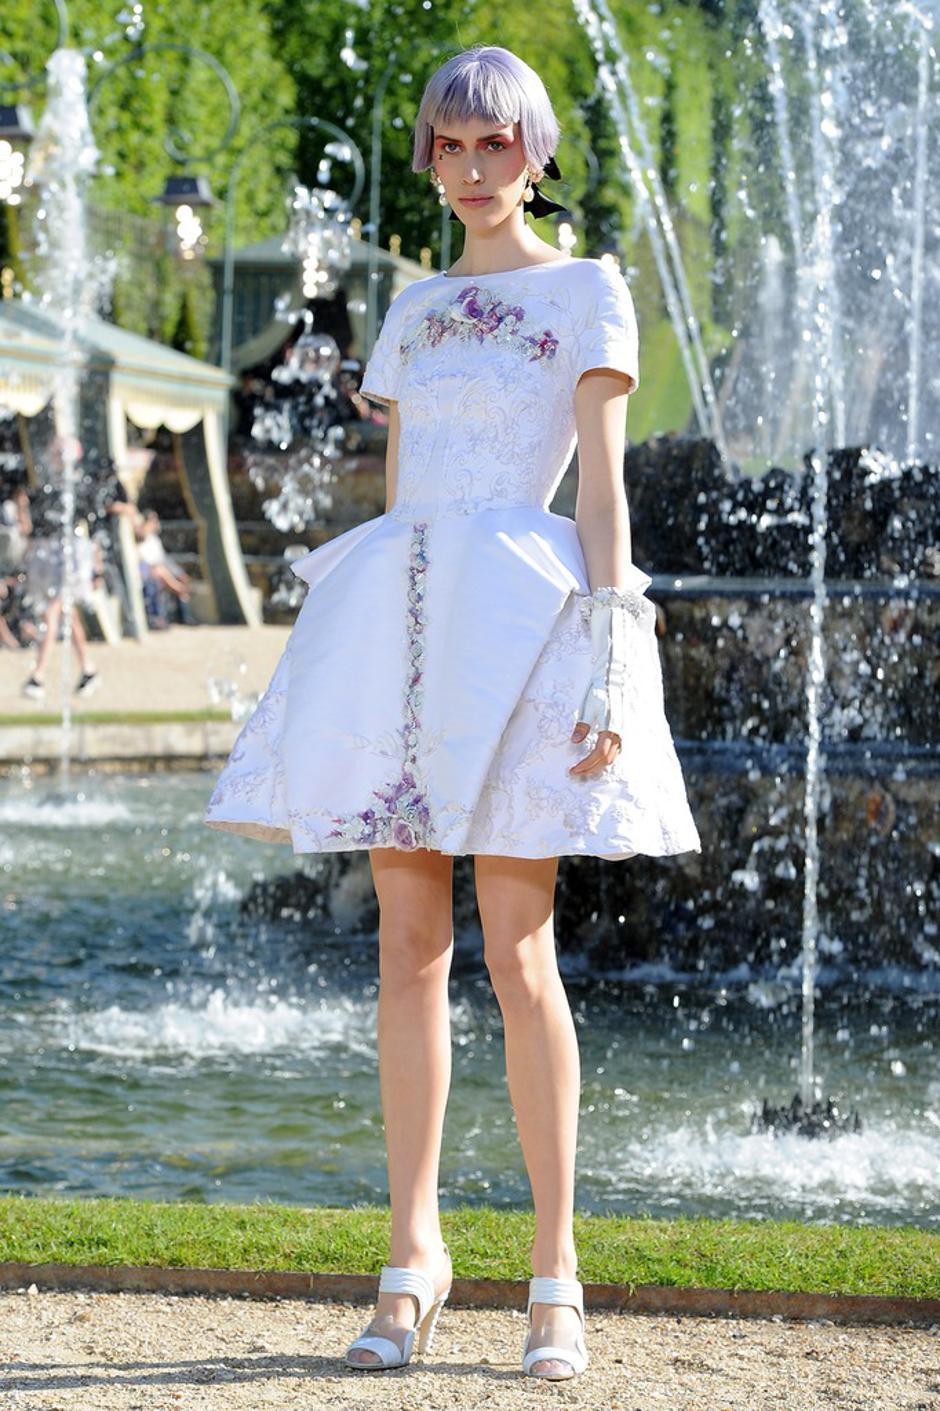 Chanel revija u vrtovima dvorca Versailles